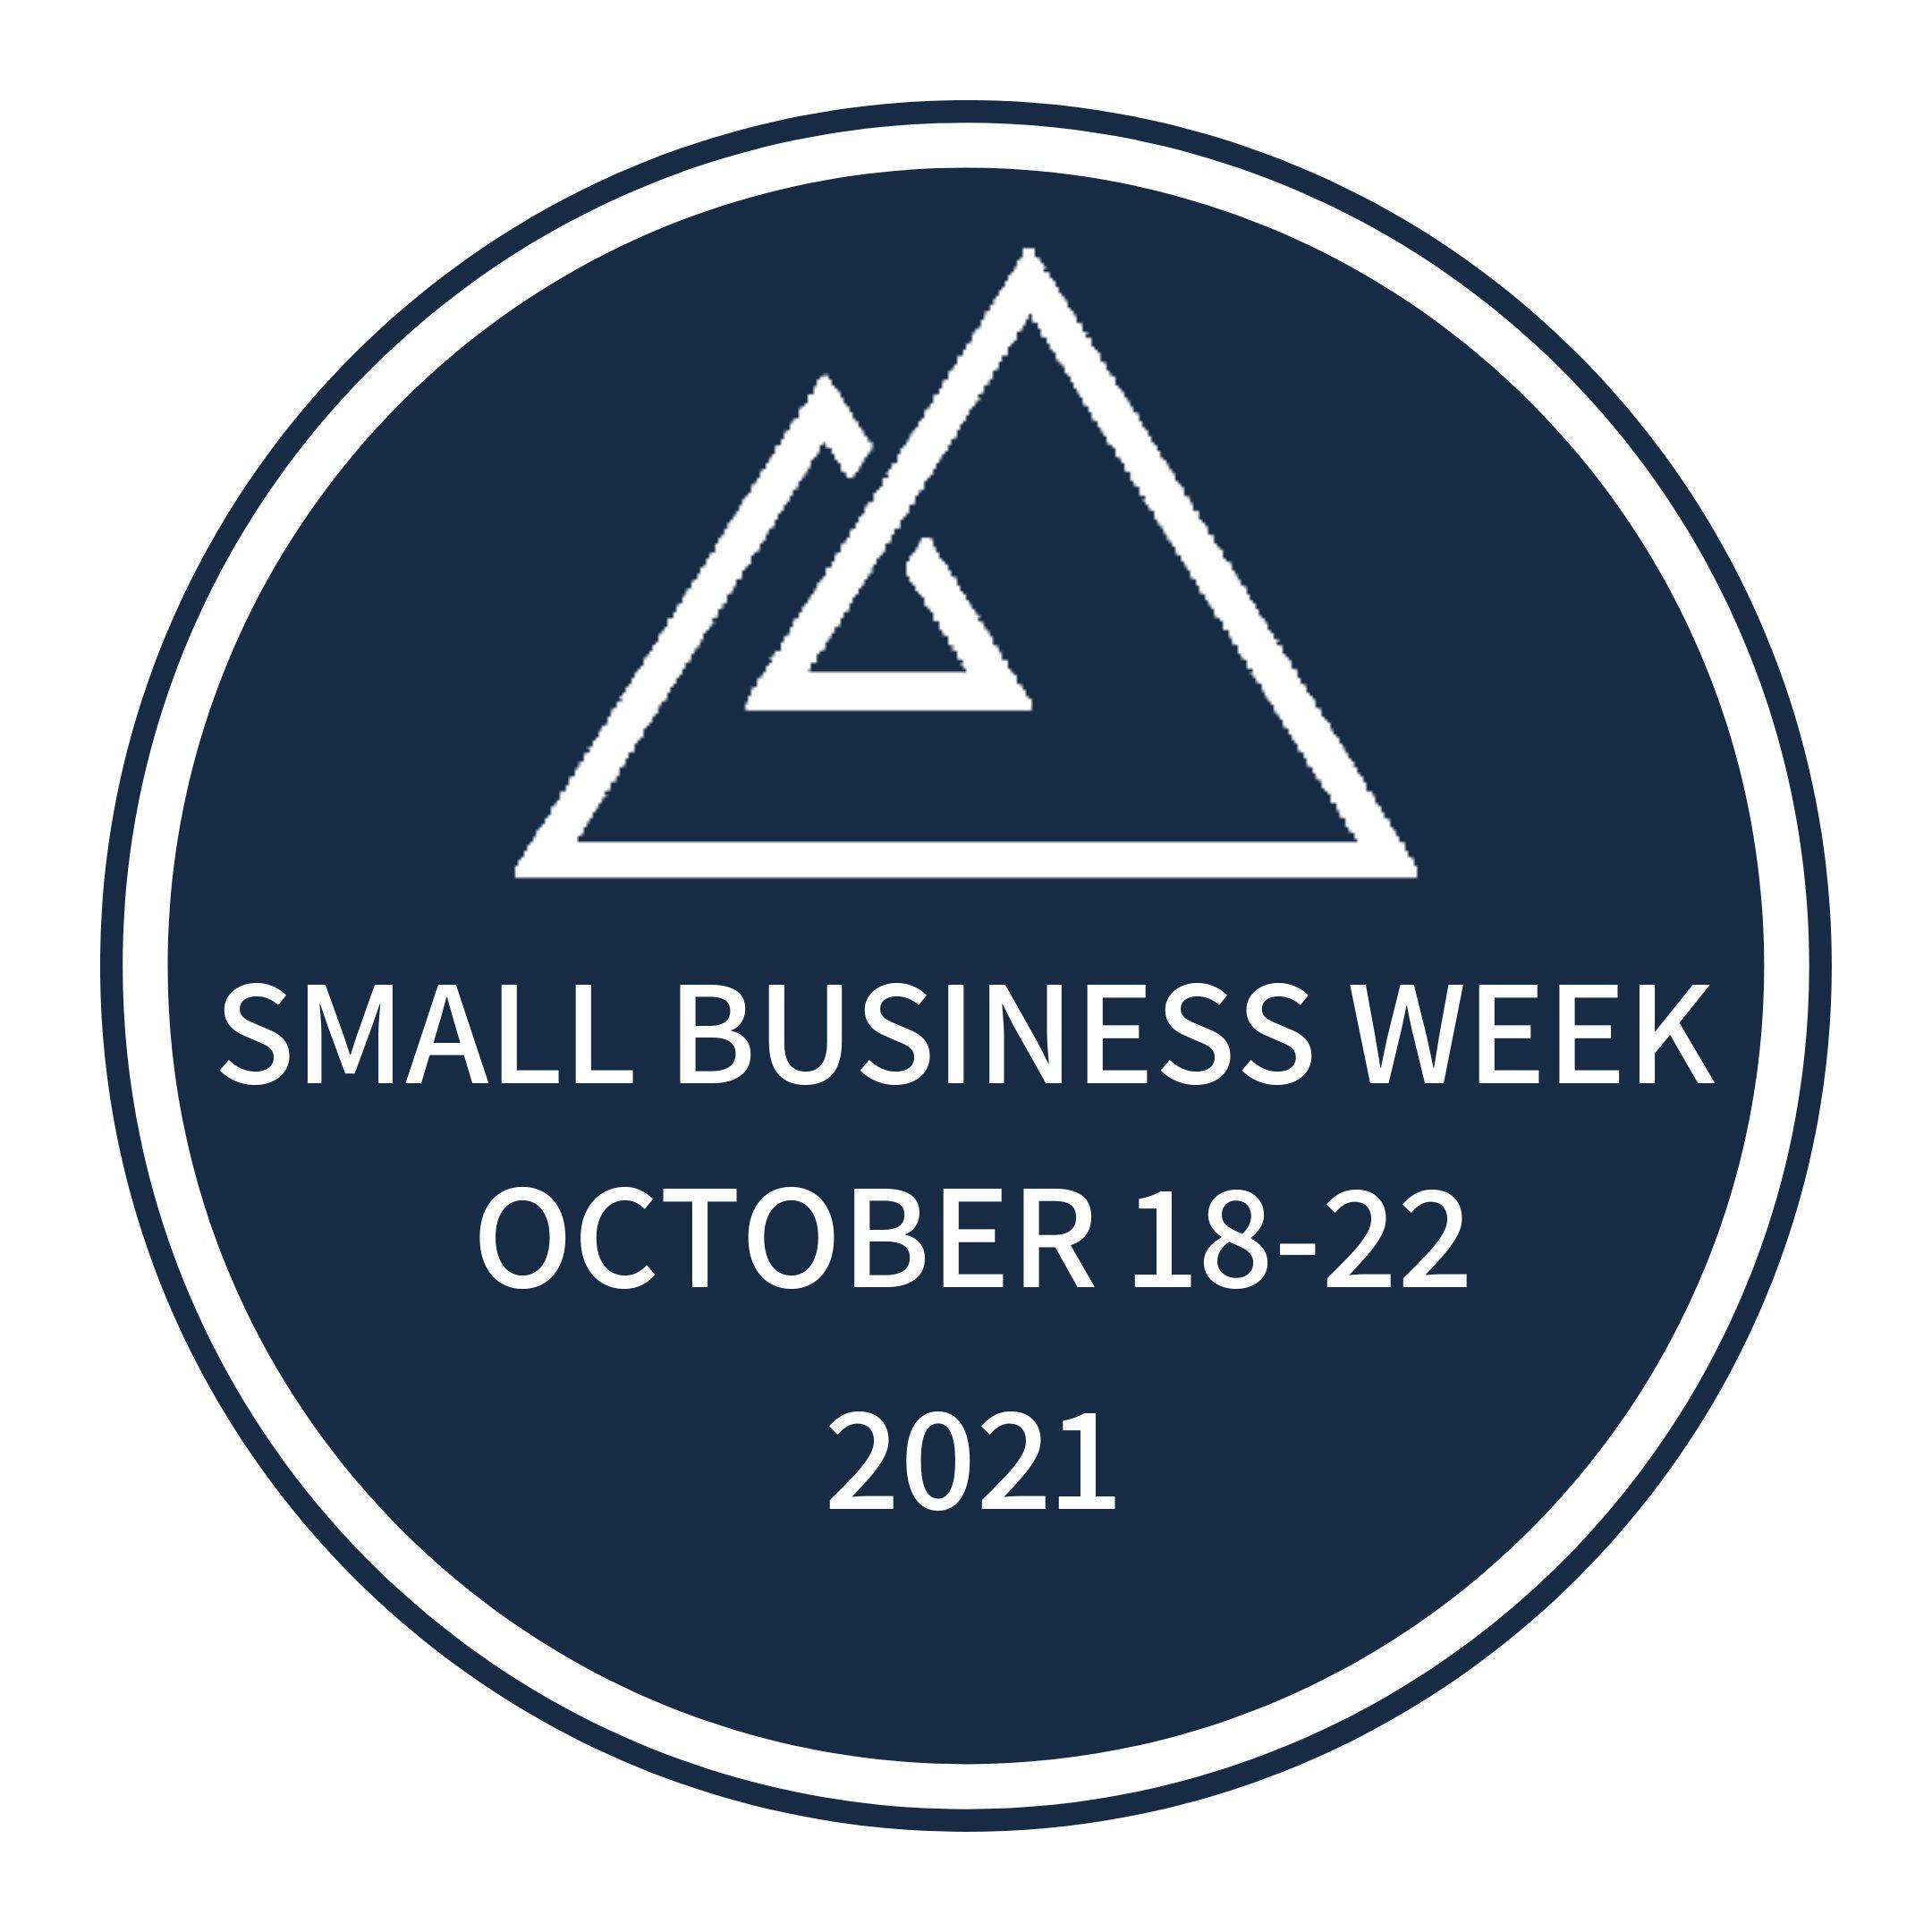 2021 Small Business Week Logo